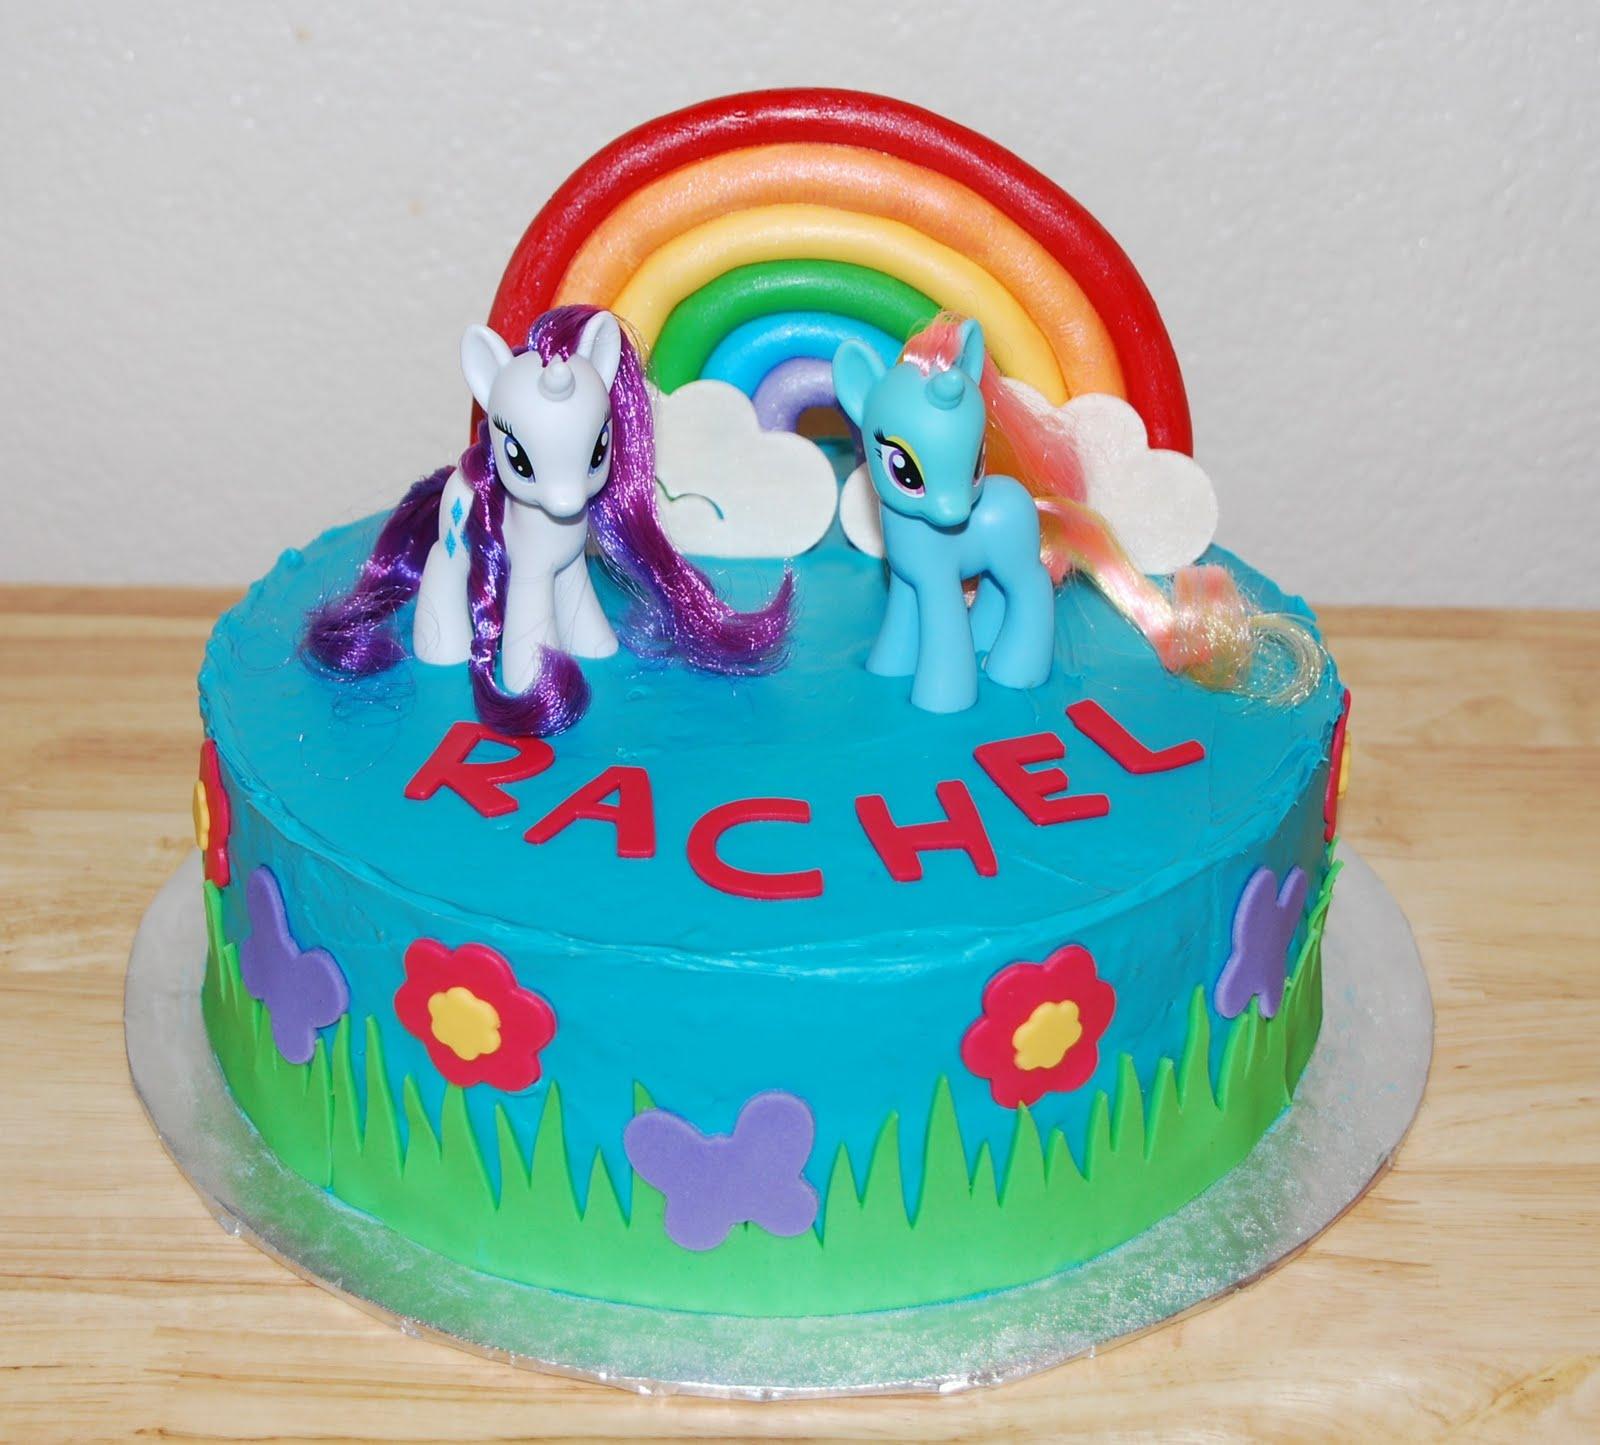 Strange My Little Pony Cakes Decoration Ideas Little Birthday Cakes Funny Birthday Cards Online Kookostrdamsfinfo